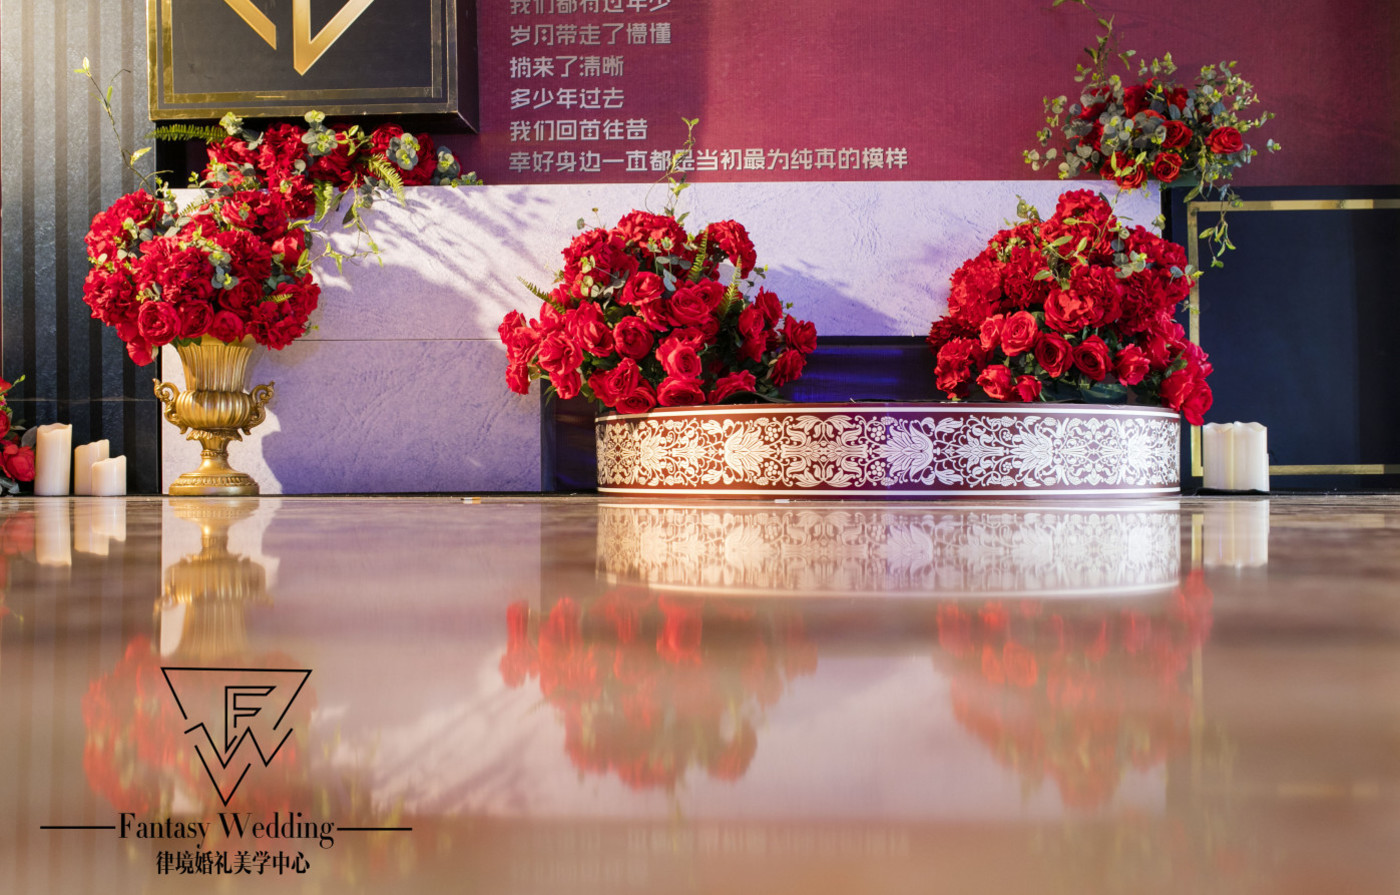 「Fantasy Wedding」& 等你下课1